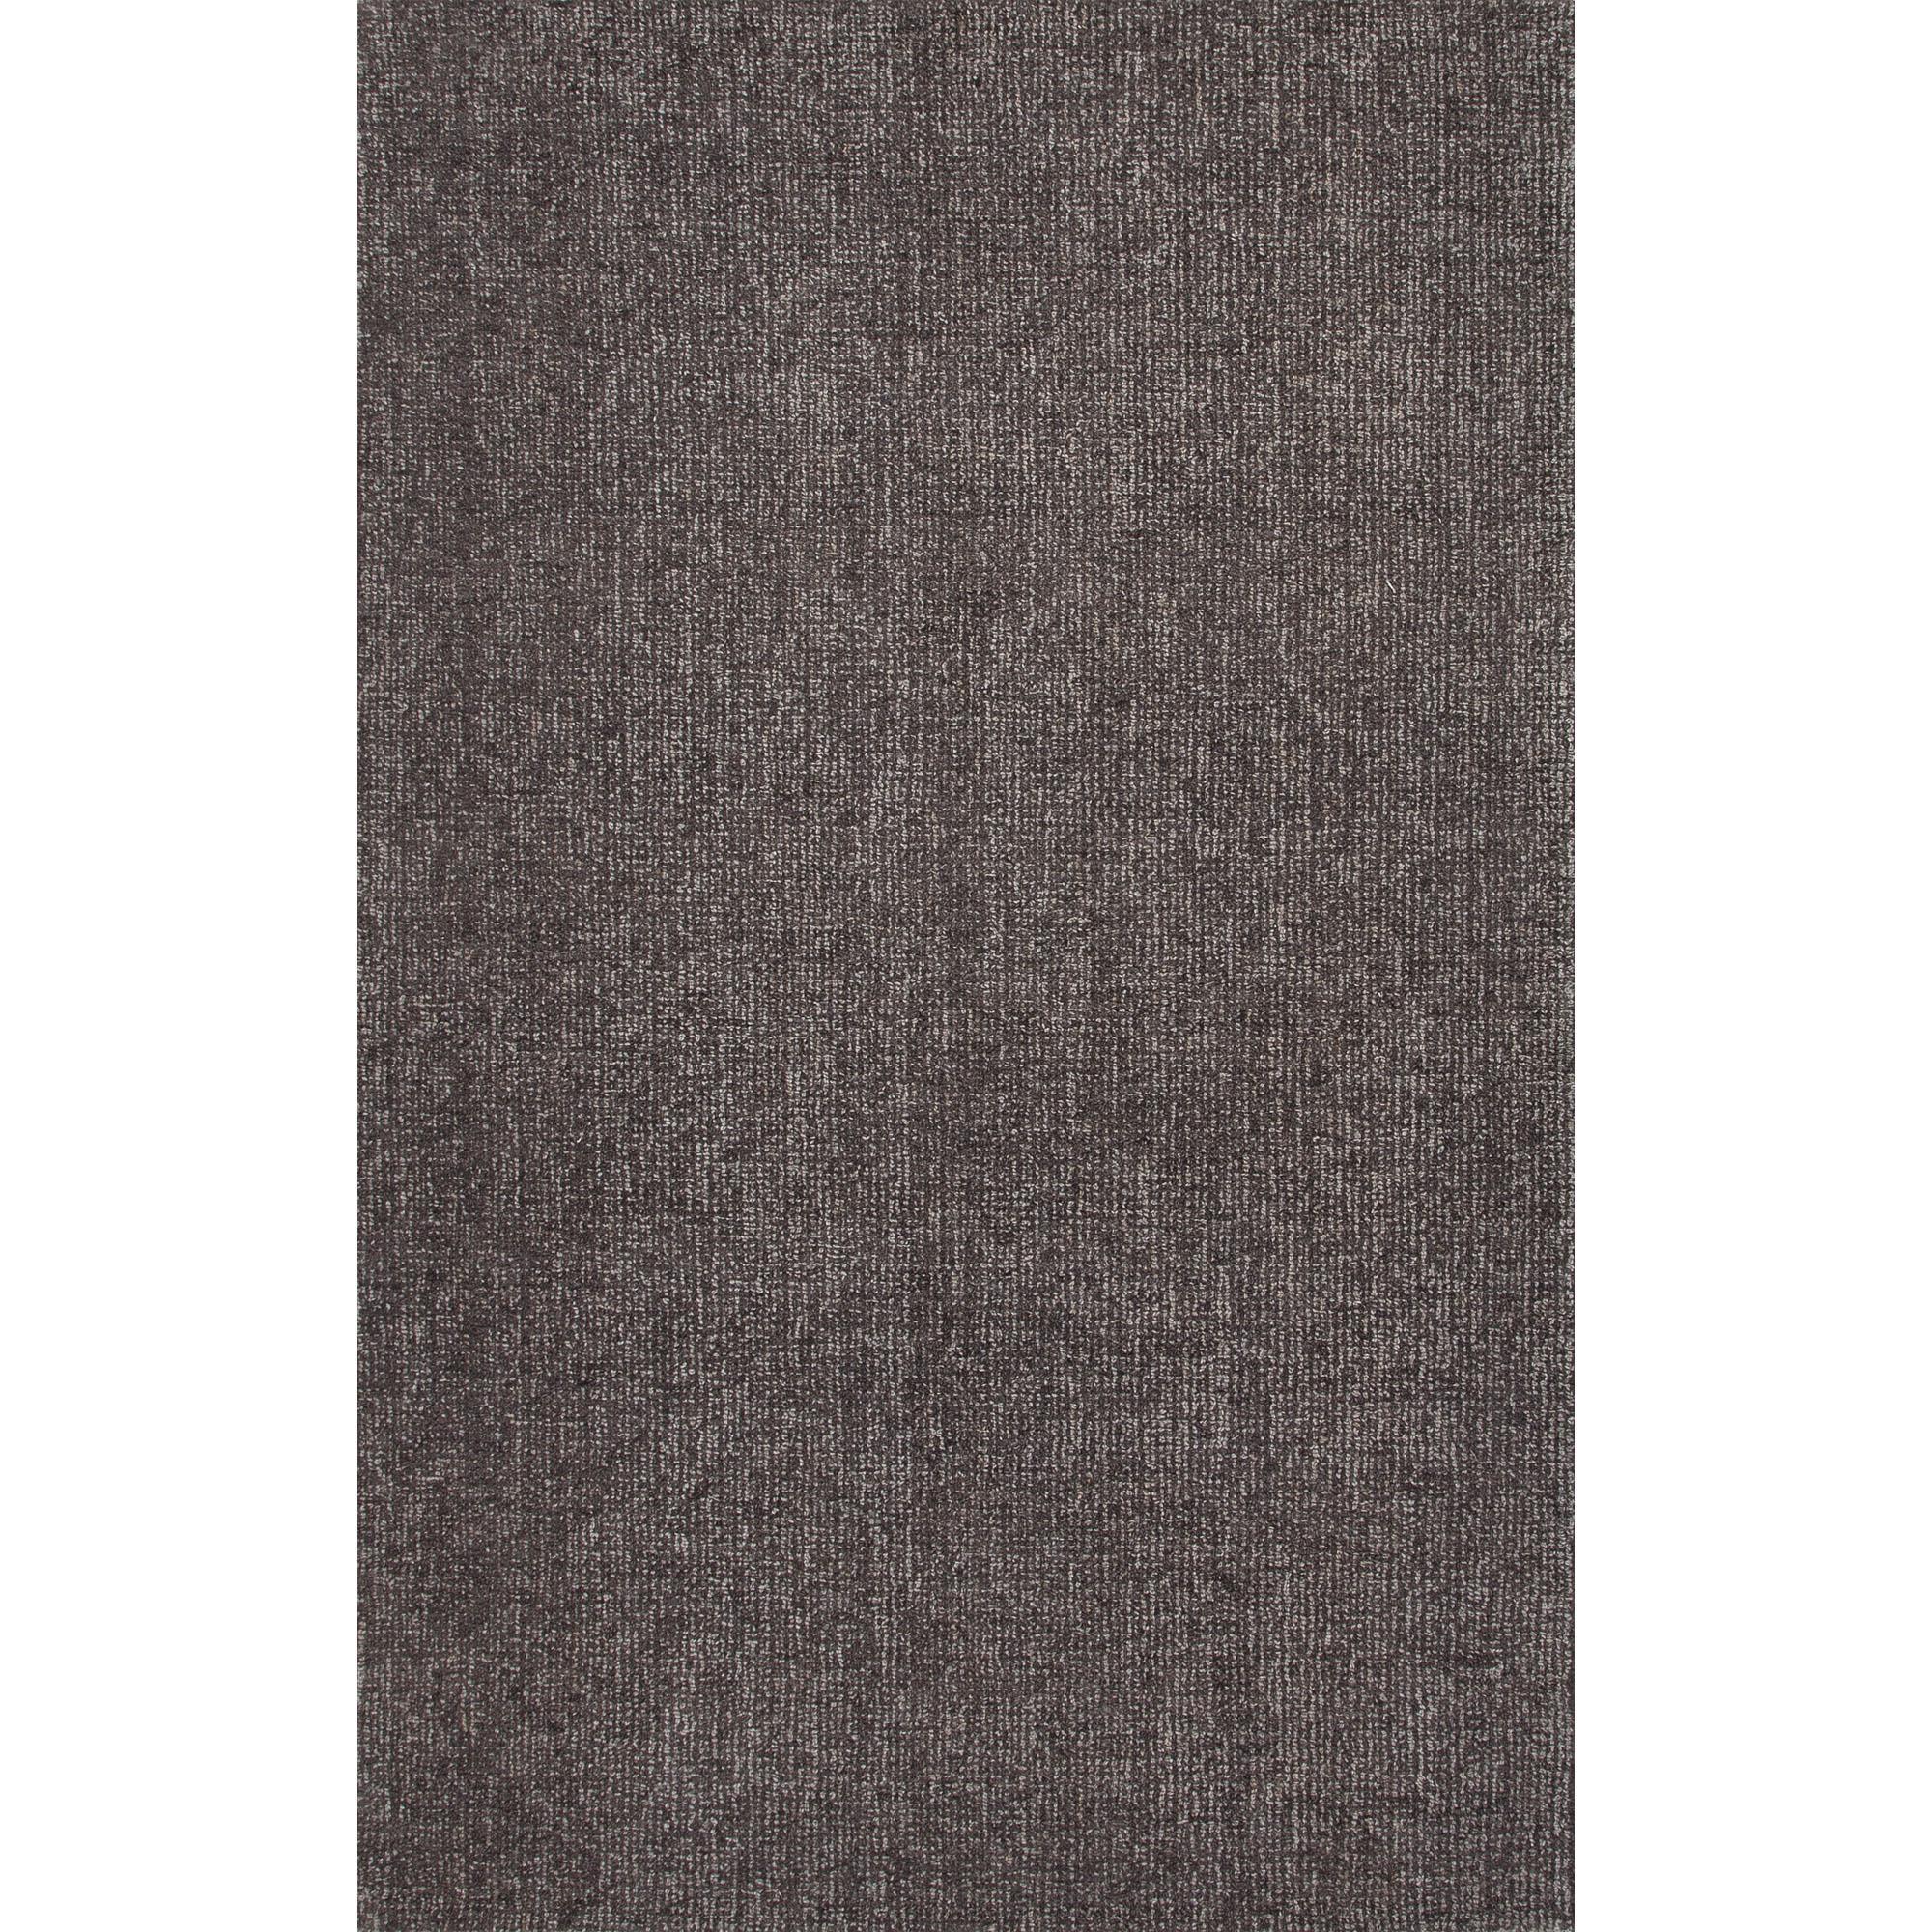 JAIPUR Rugs Britta 9 x 12 Rug - Item Number: RUG117561